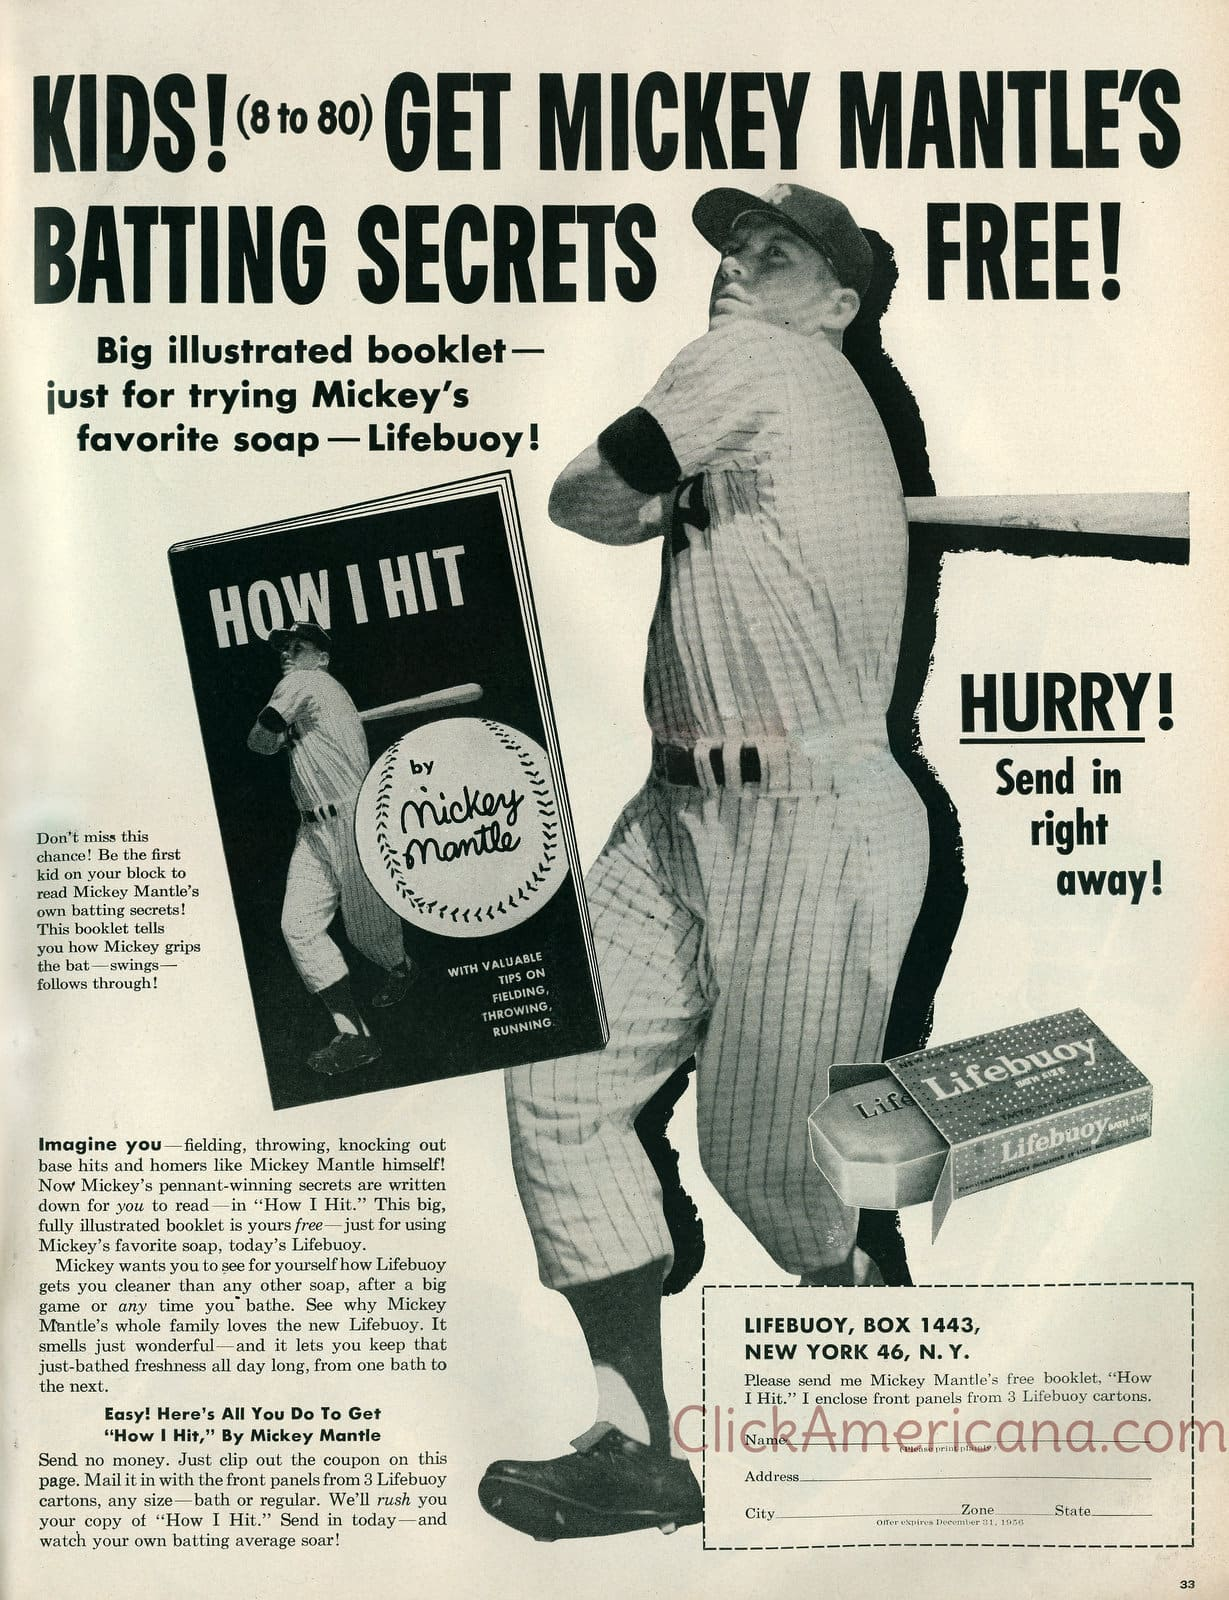 Mickey Mantle's batting secrets book - How I Hit (1956)